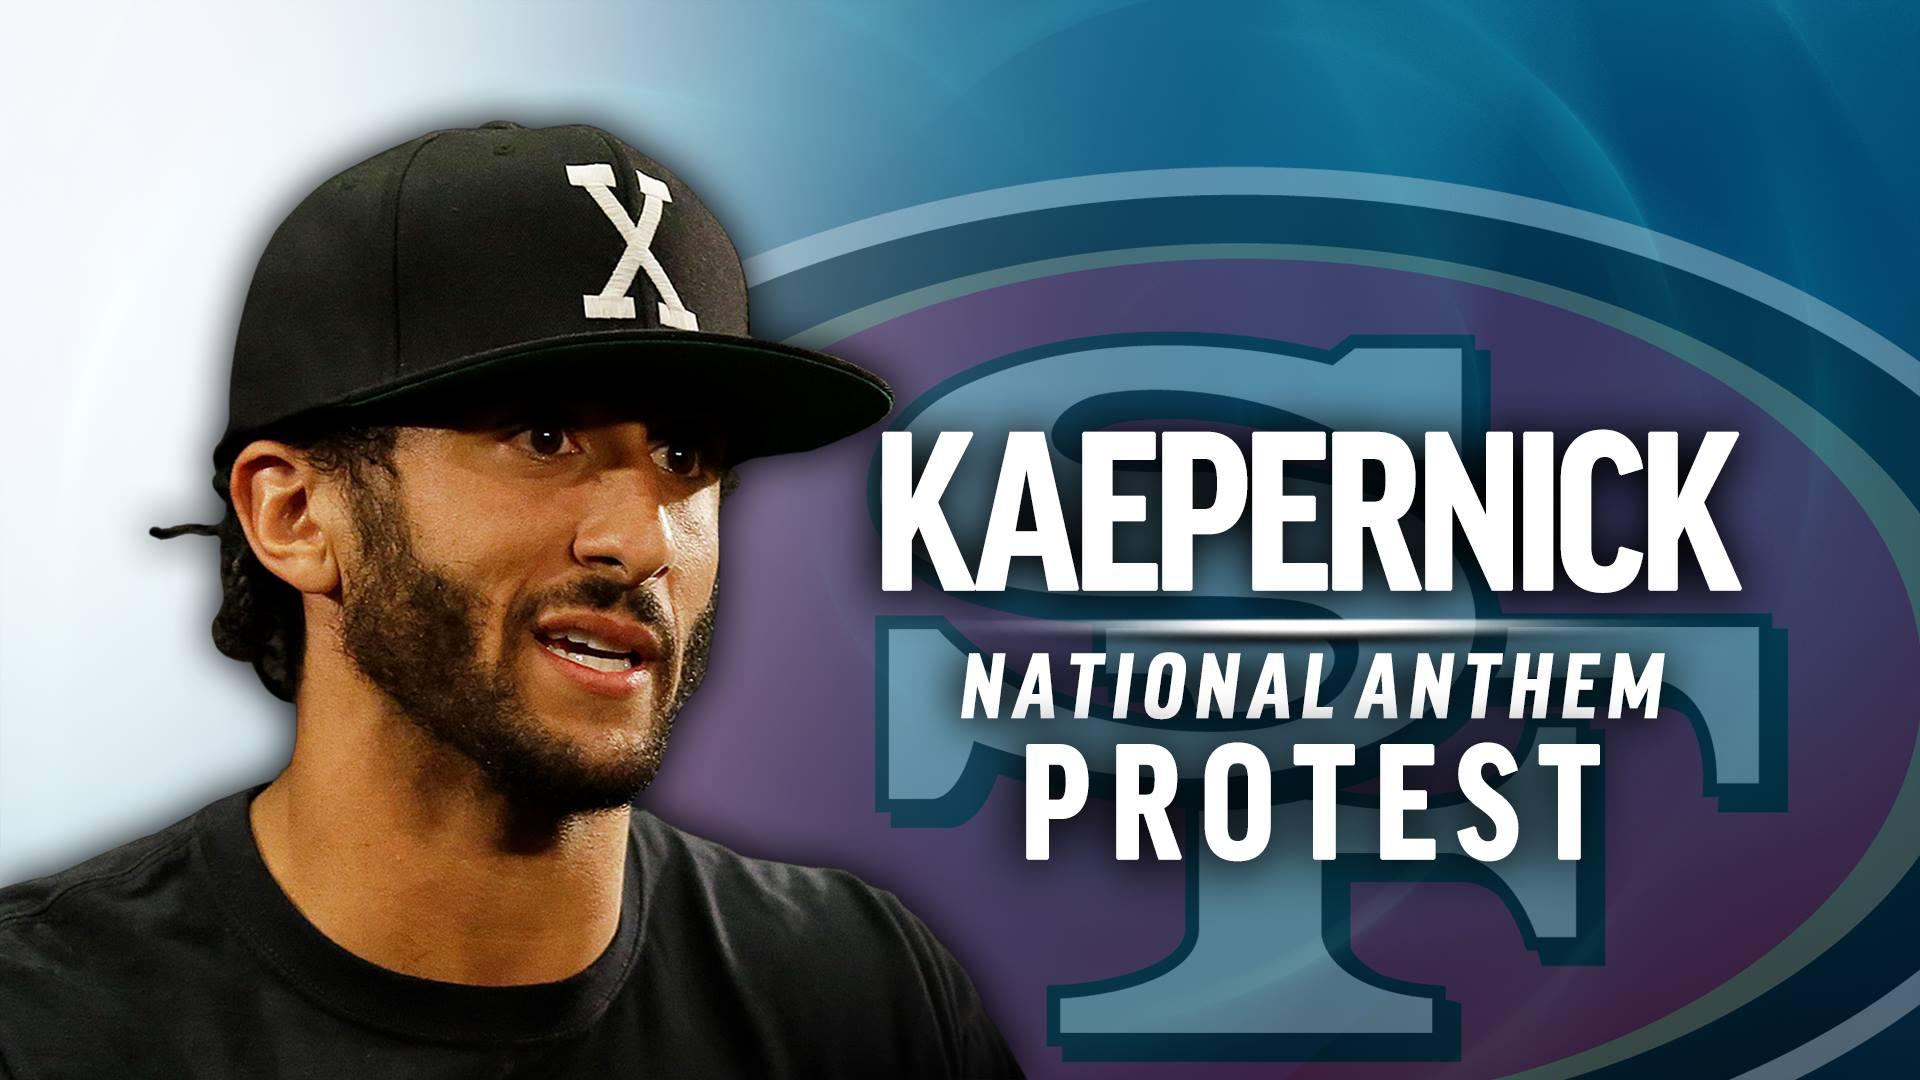 Obama Defends Kaepernick for Not Standing During National Anthem